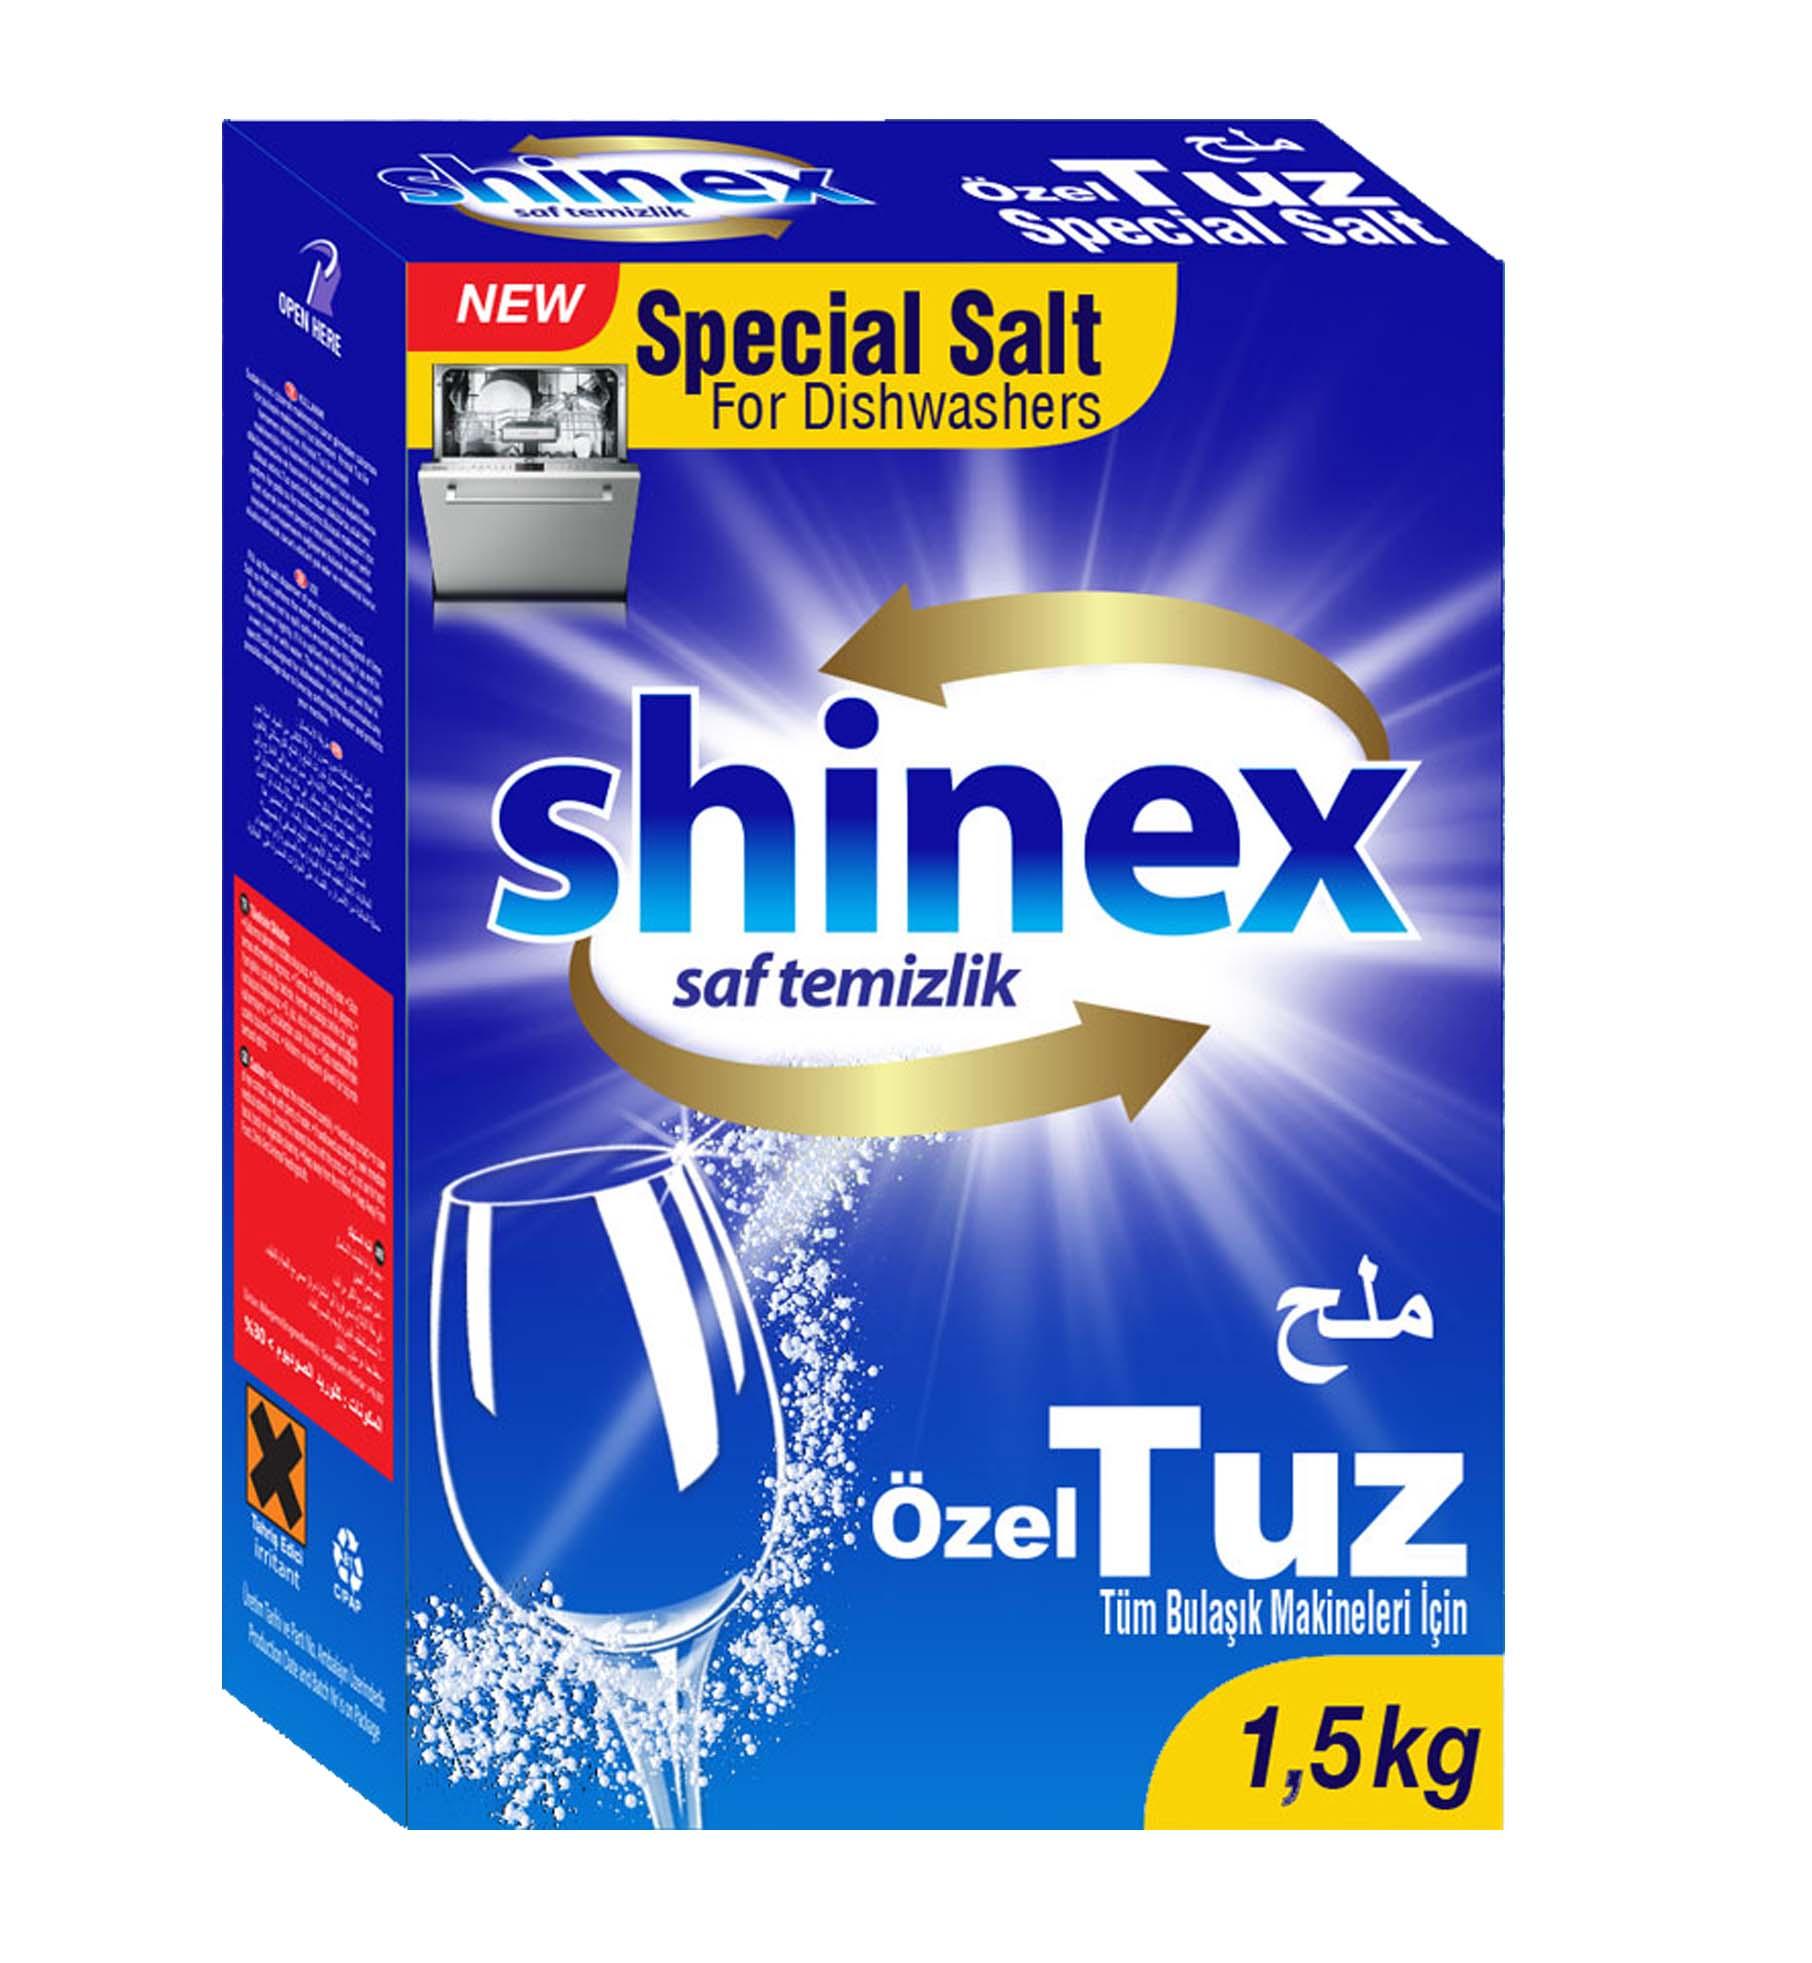 Shinex Dishwasher Salt 1,5 Kg